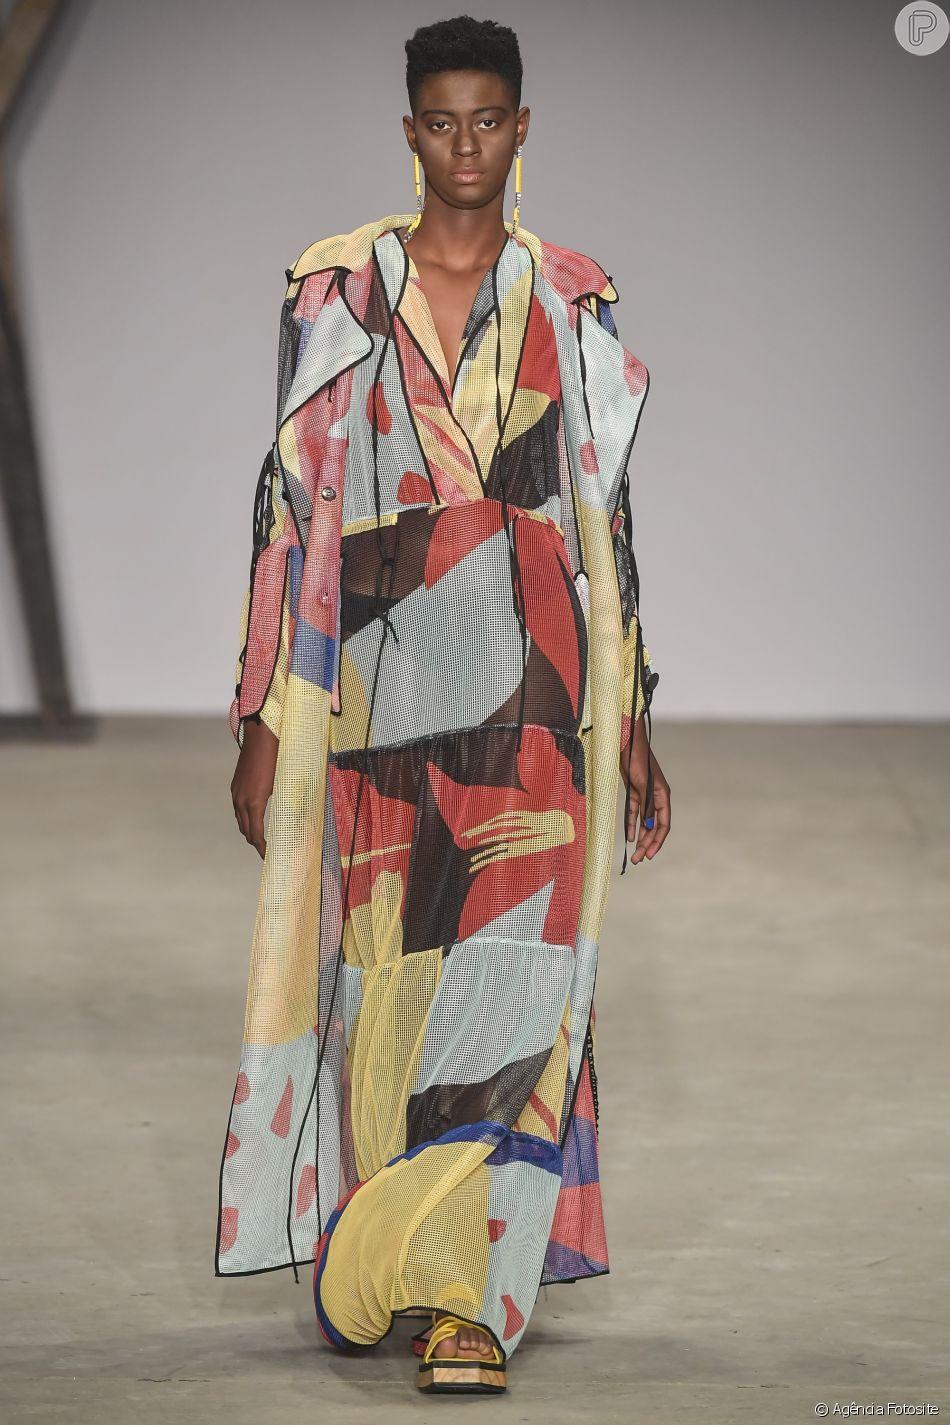 Estampas que foram sucesso no São Paulo Fashion Week: artsy print no look Apartamento 03